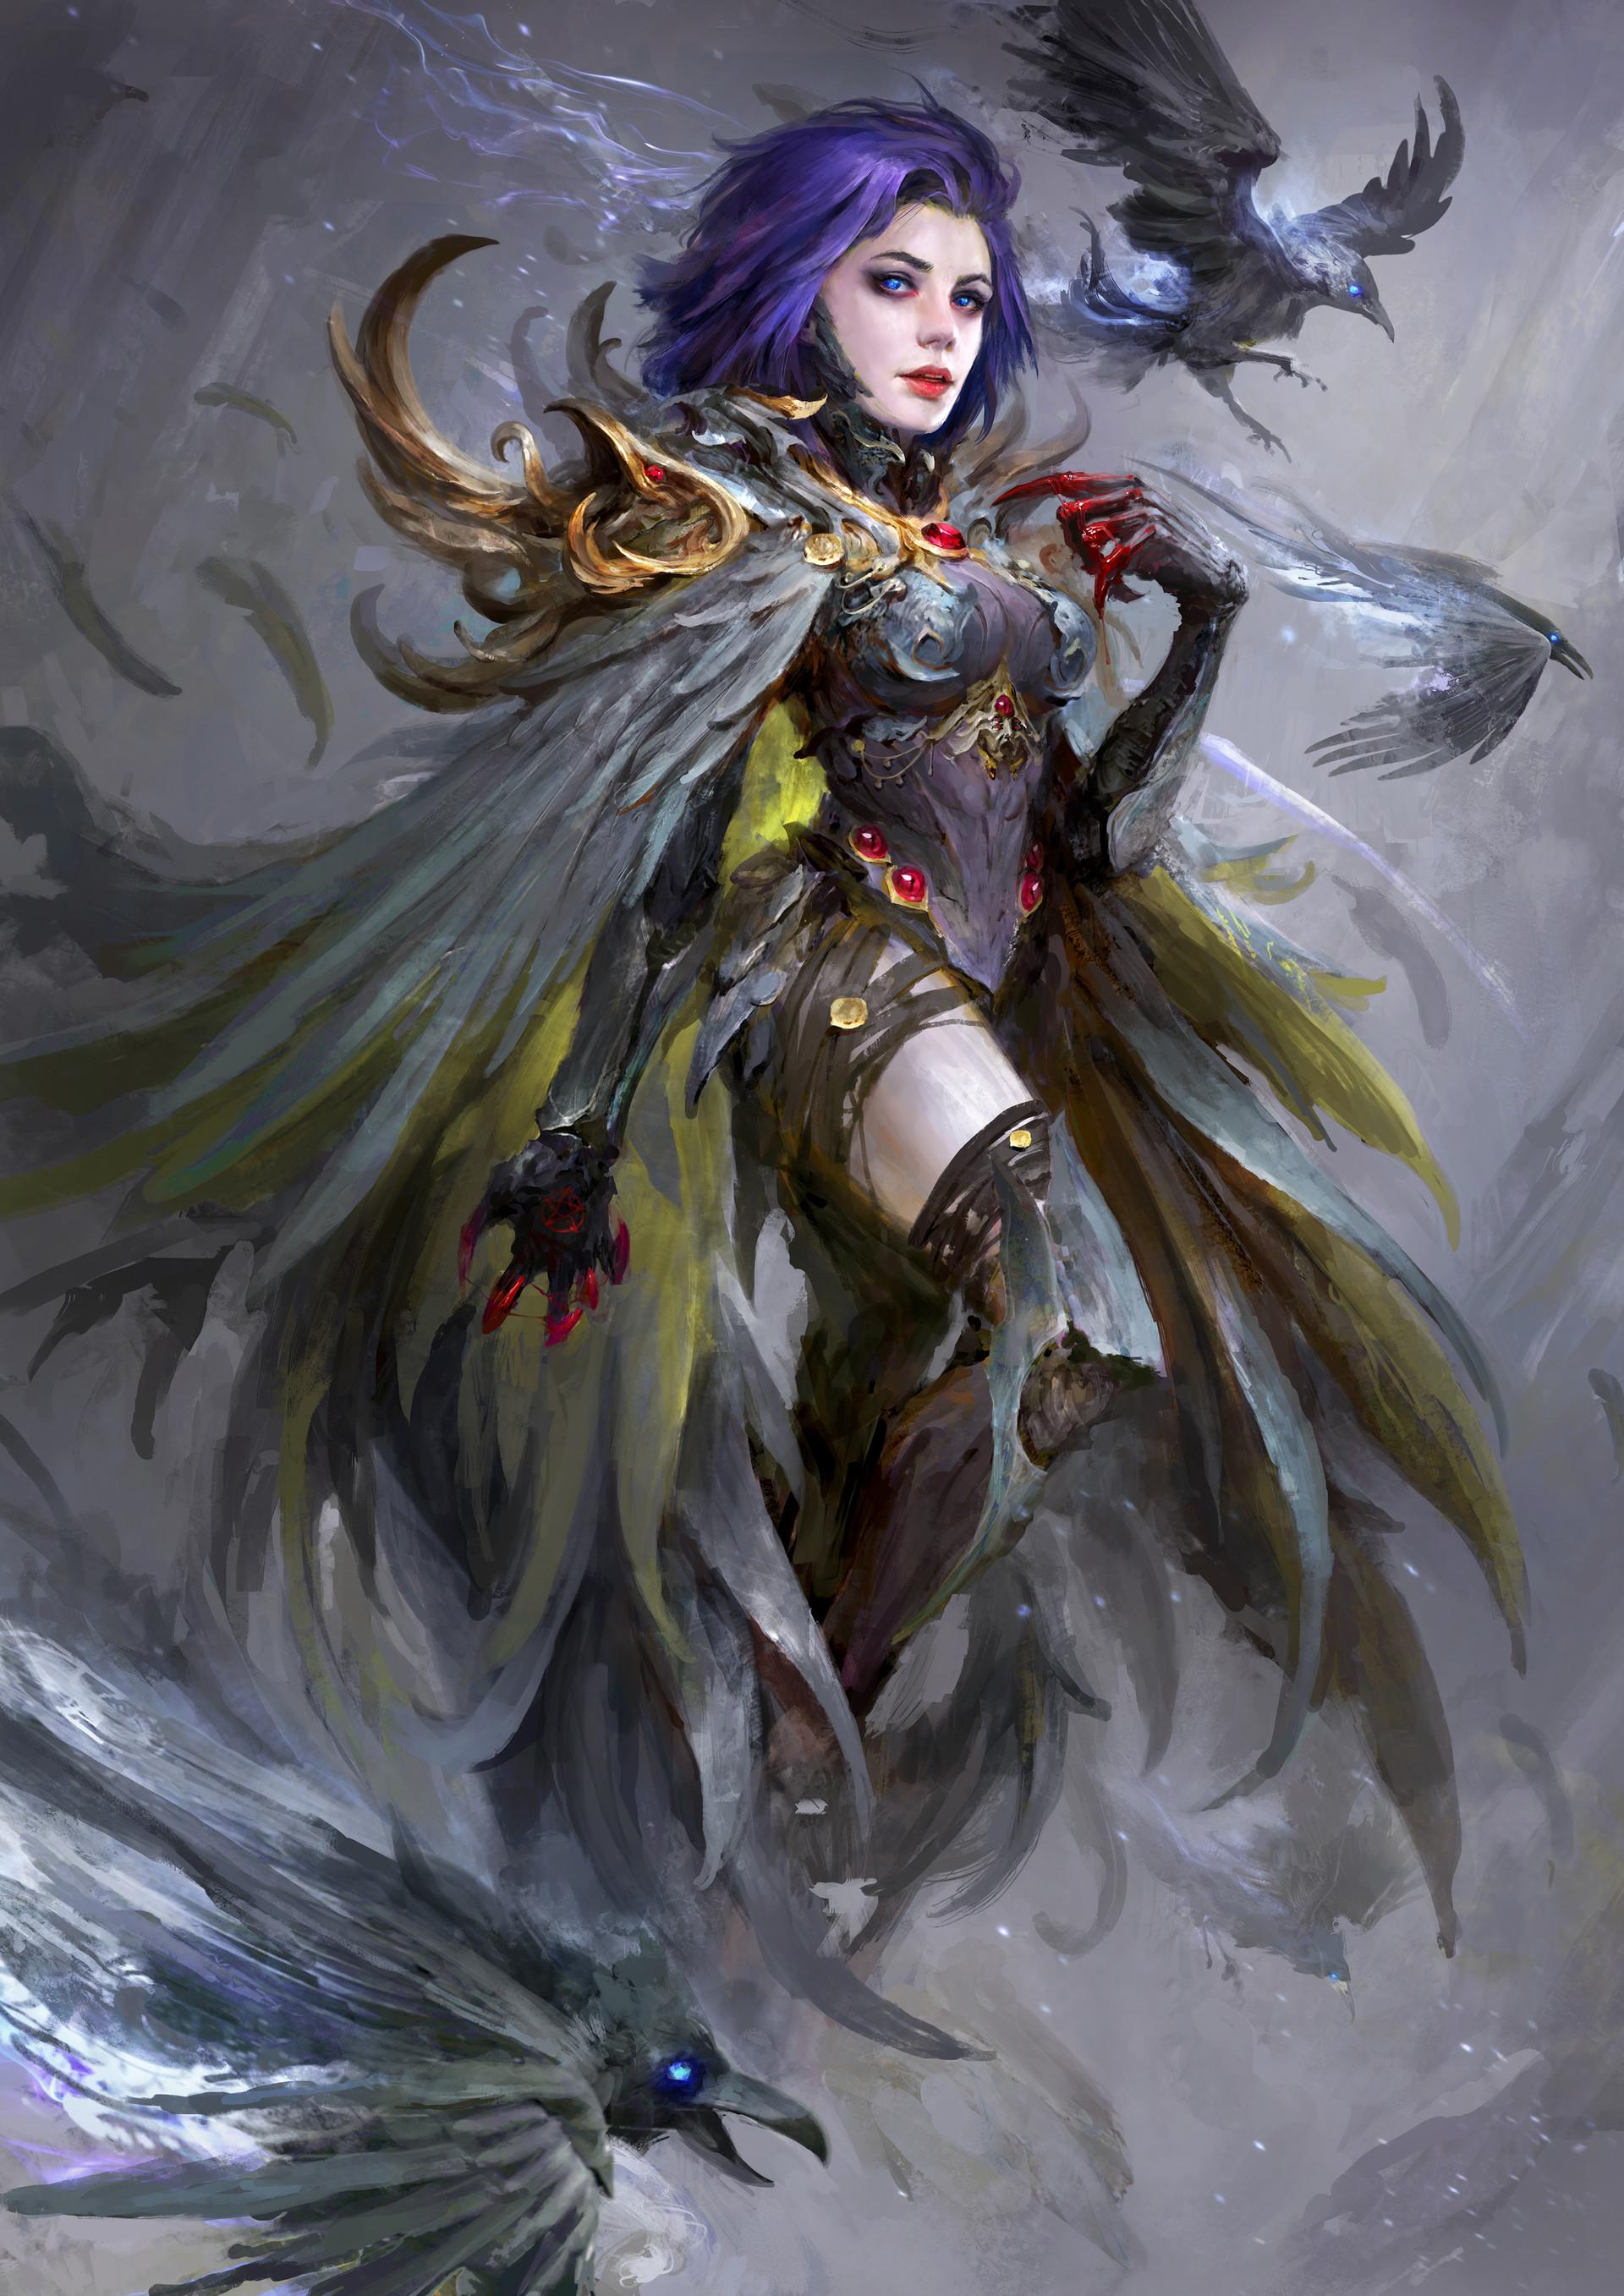 Overwatch Girl Fanart Wallpaper Artstation Raven Daniel Kamarudin